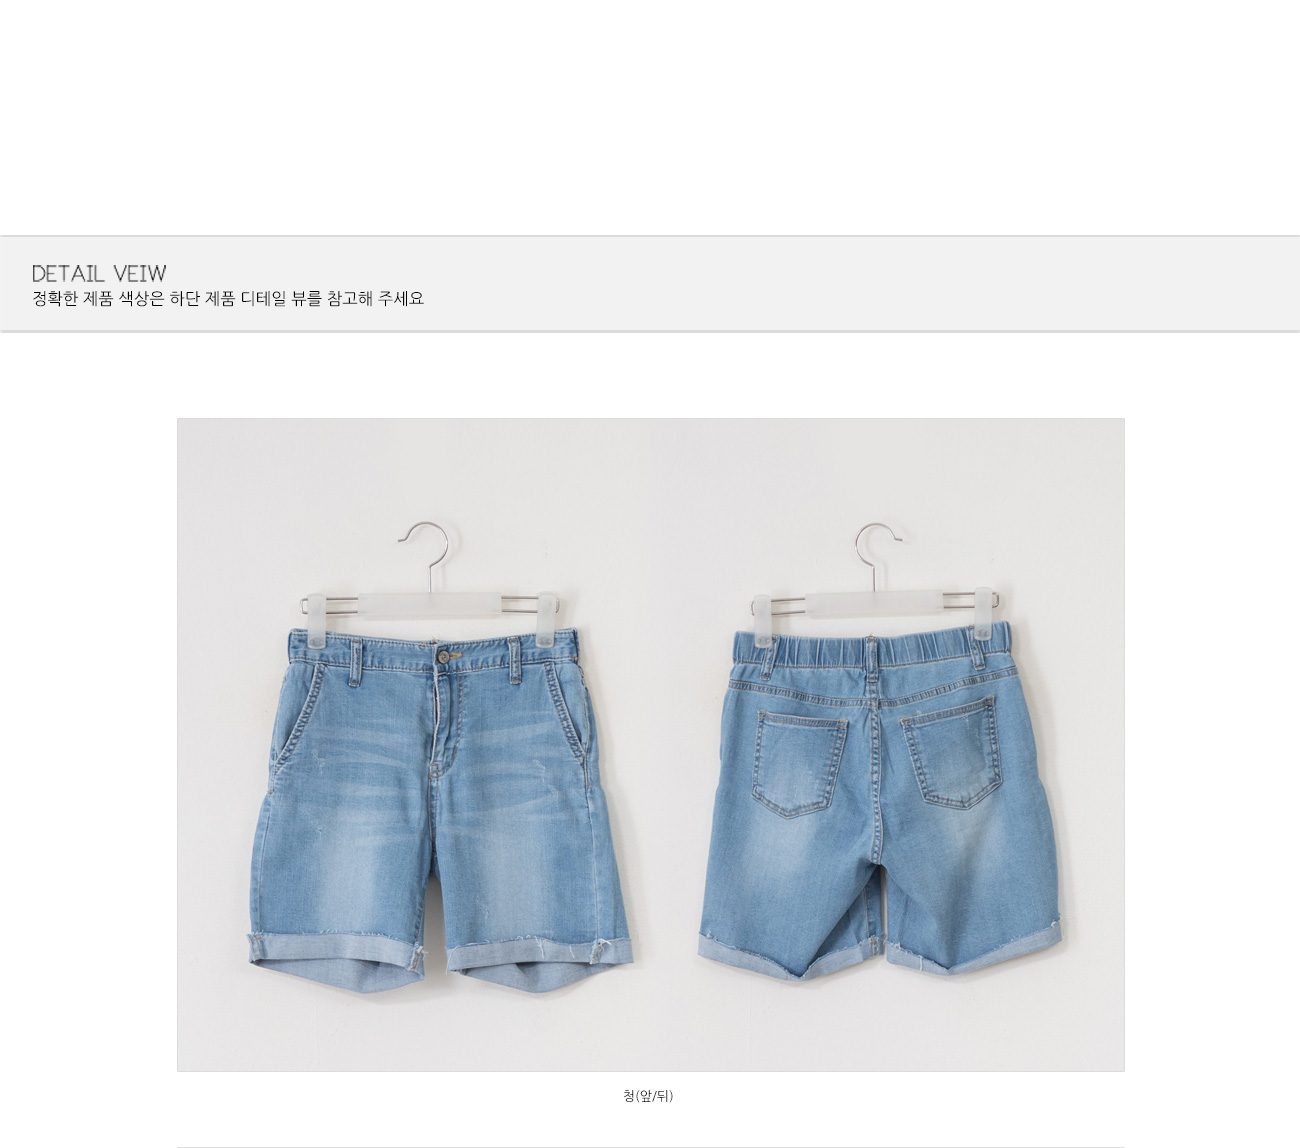 Roll-up denim short pants #73786